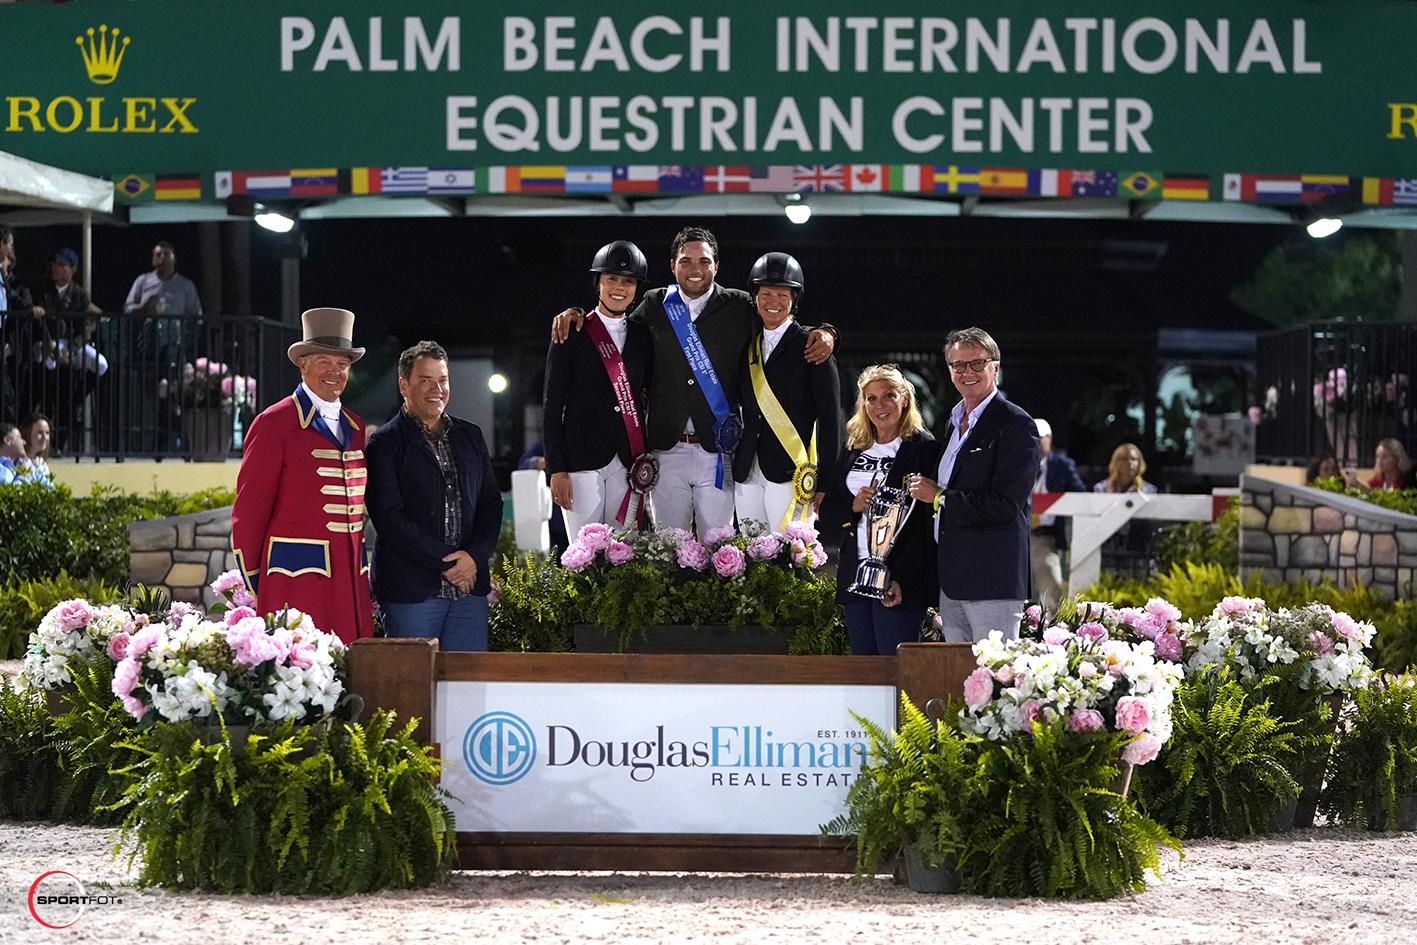 Karen Polle Daniel Bluman Beezie Madden podium 43100232 Sportfot